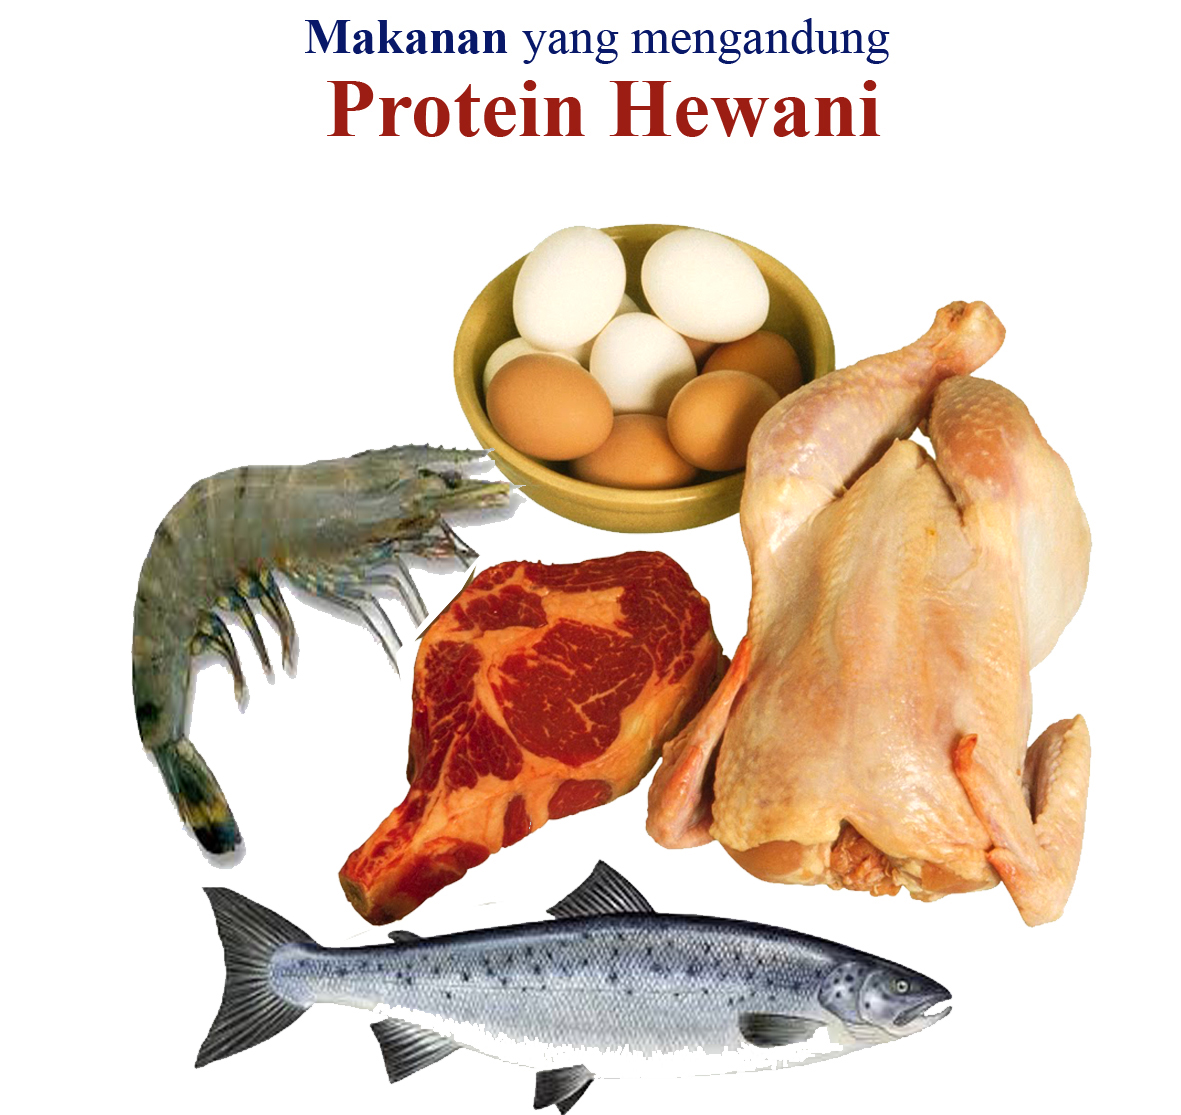 Makanan Yang Mengandung Protein Hewani Tugas Sekolah Ku